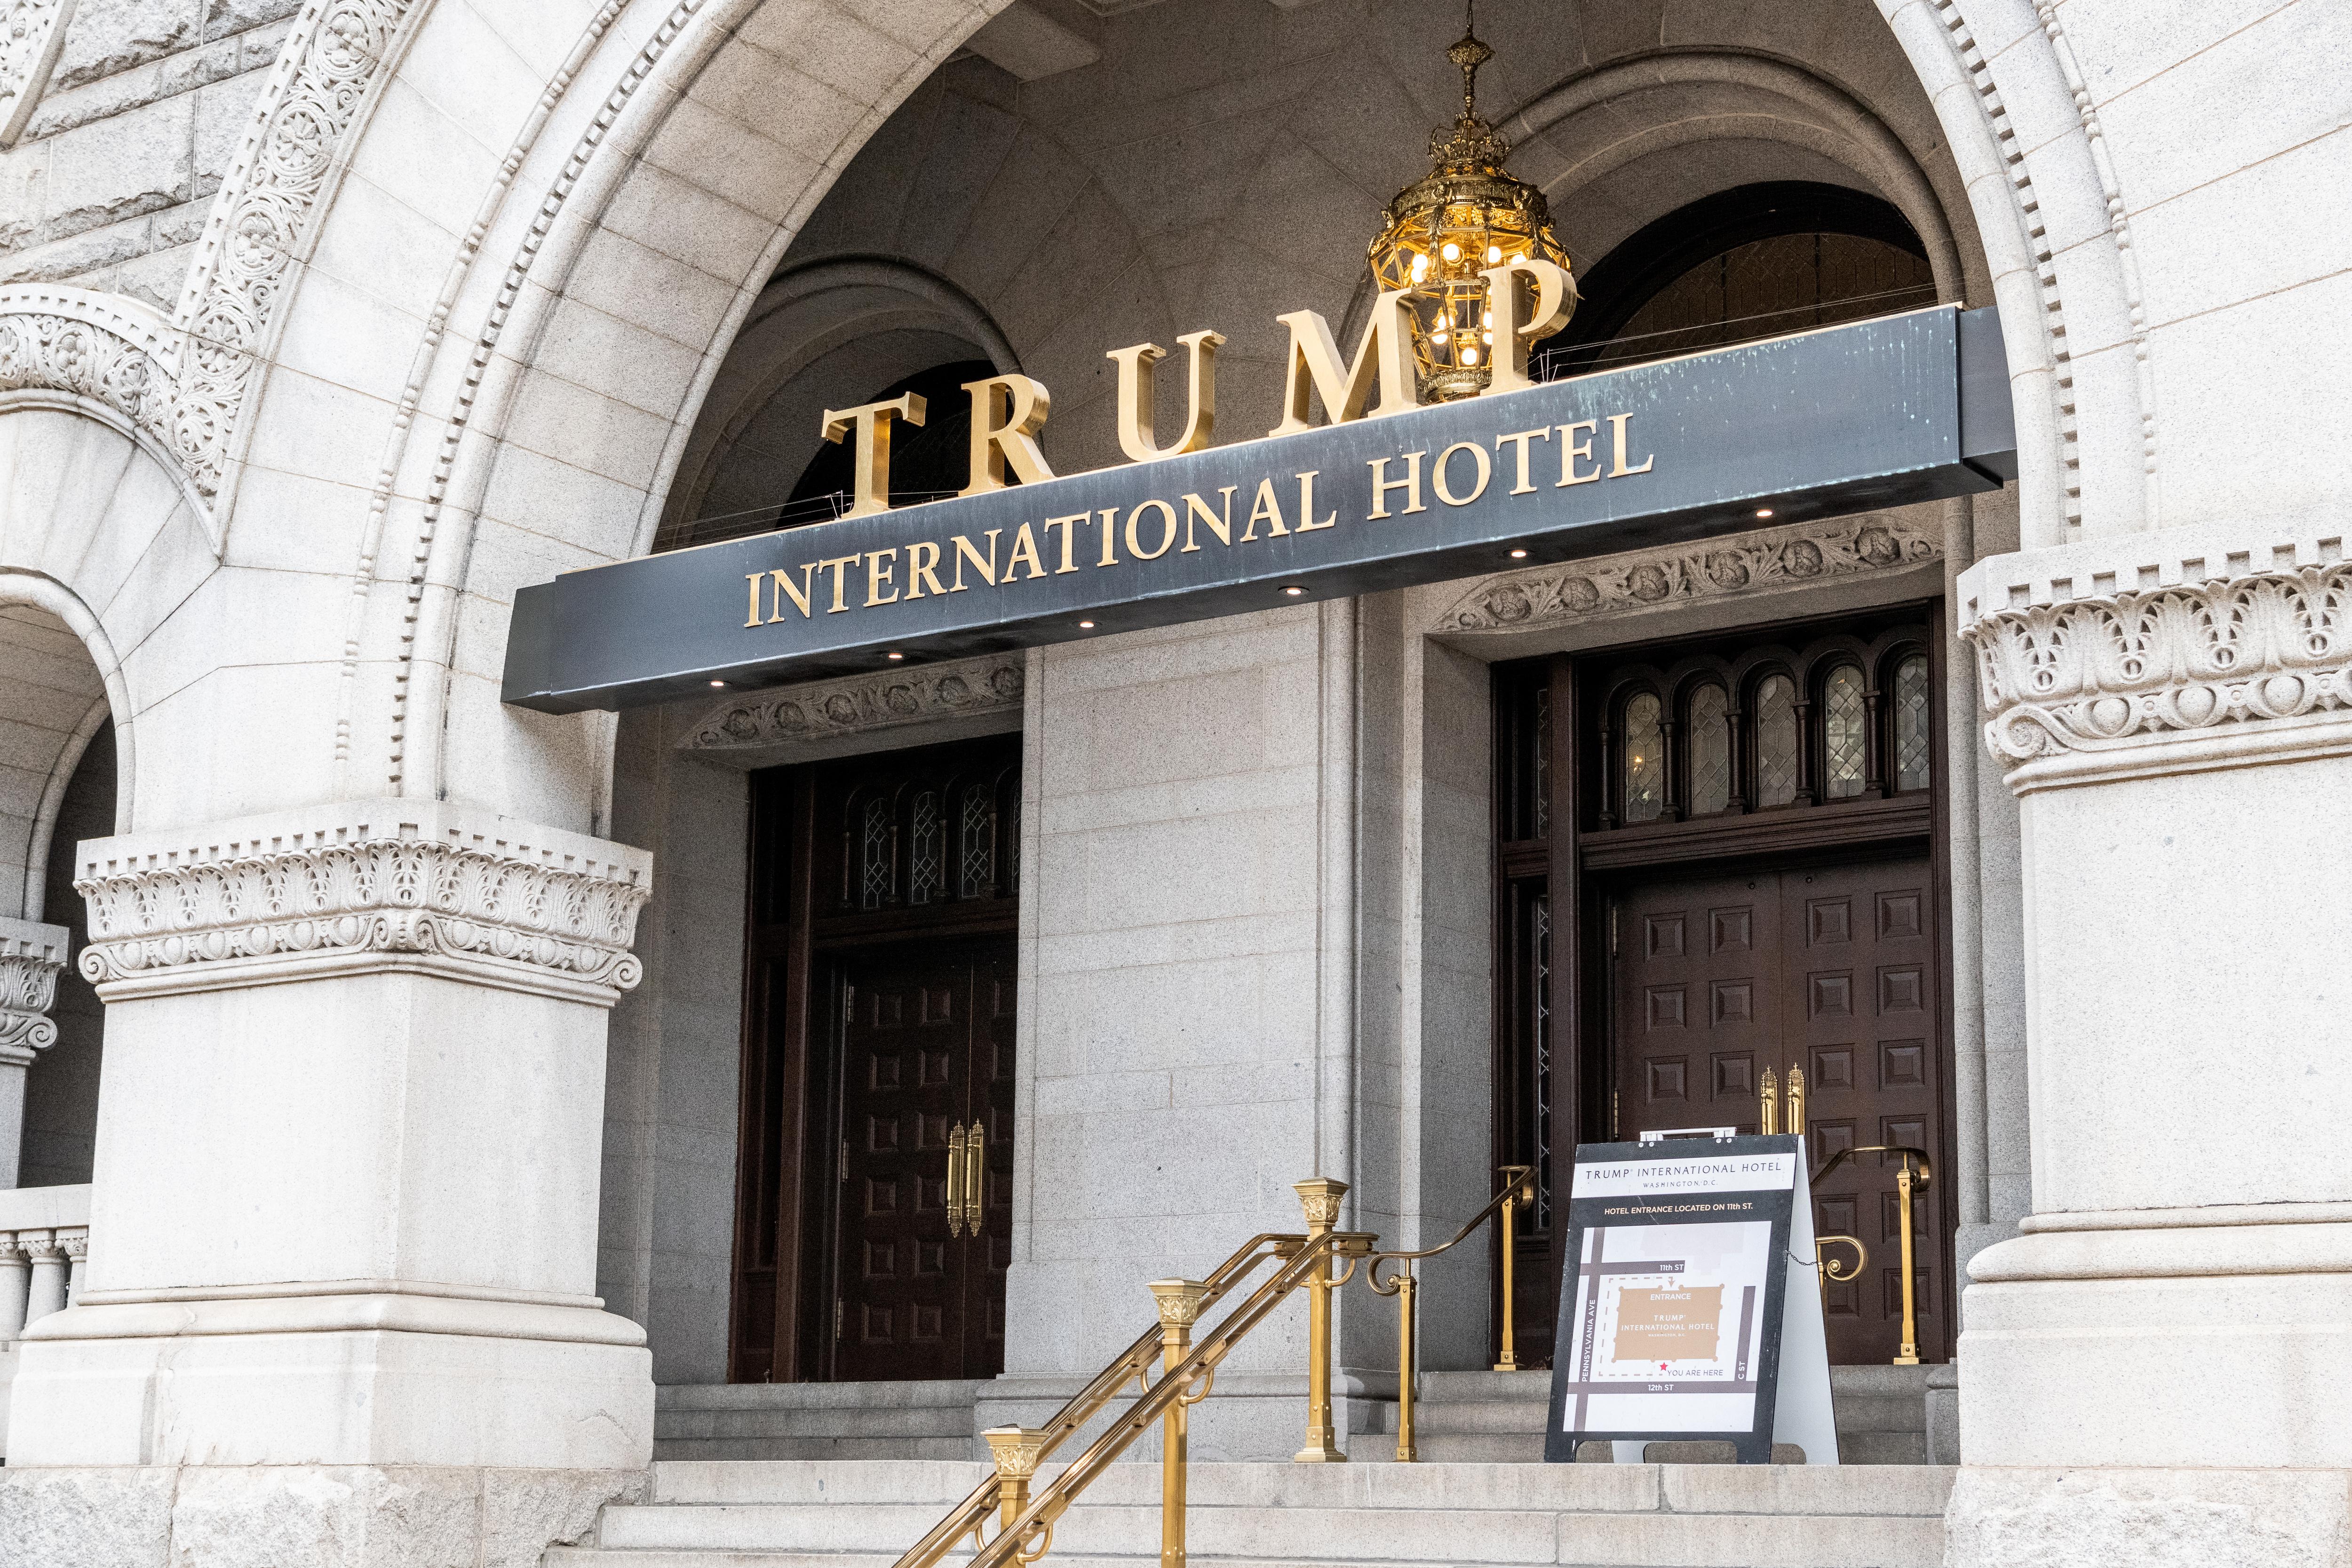 Trump International Hotel in Washington, D.C. is seen on Nov. 12, 2018.